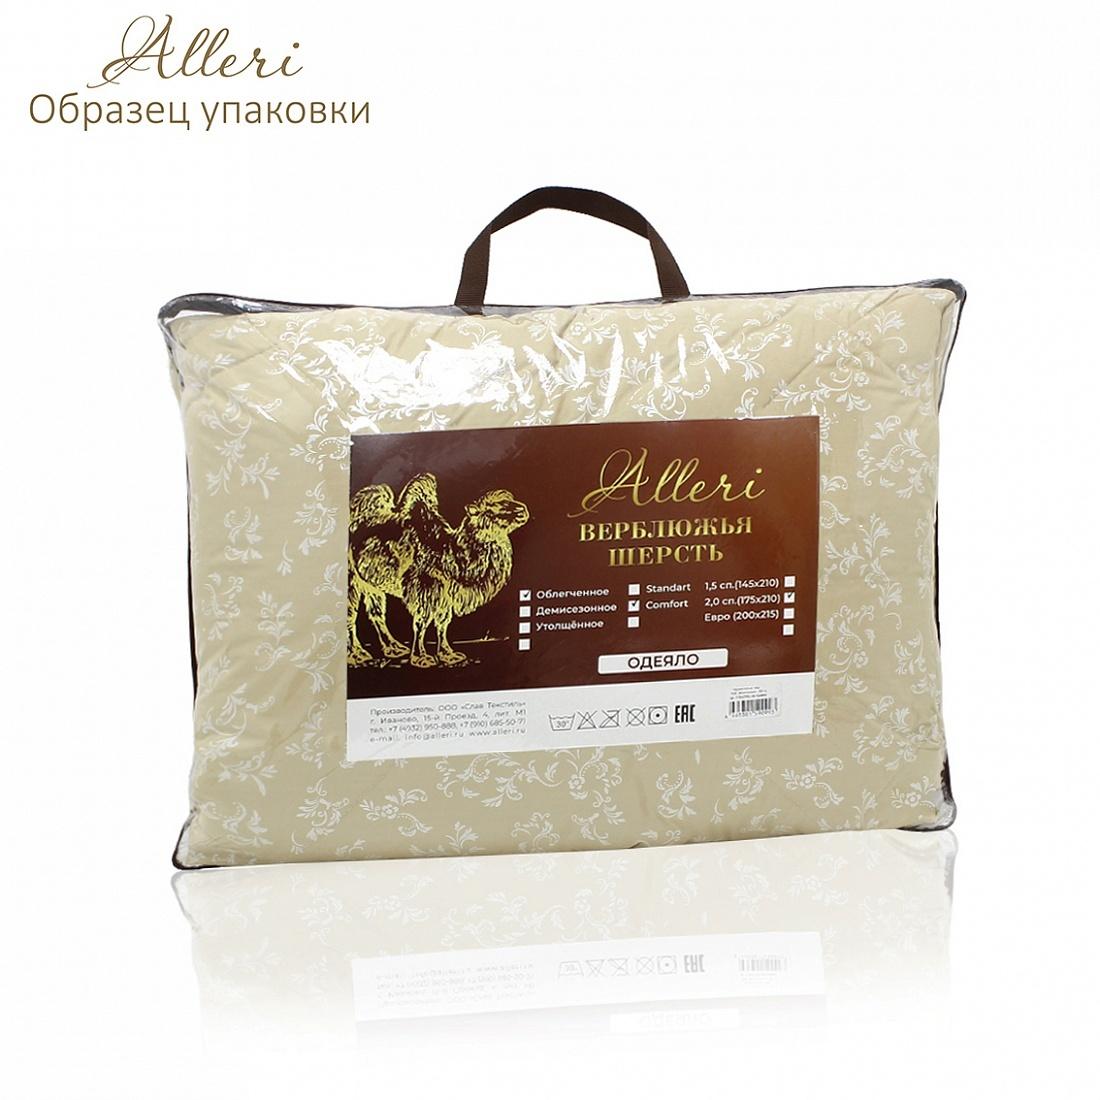 Одеяло Верблюжья шерсть (ТИК), 100 гр